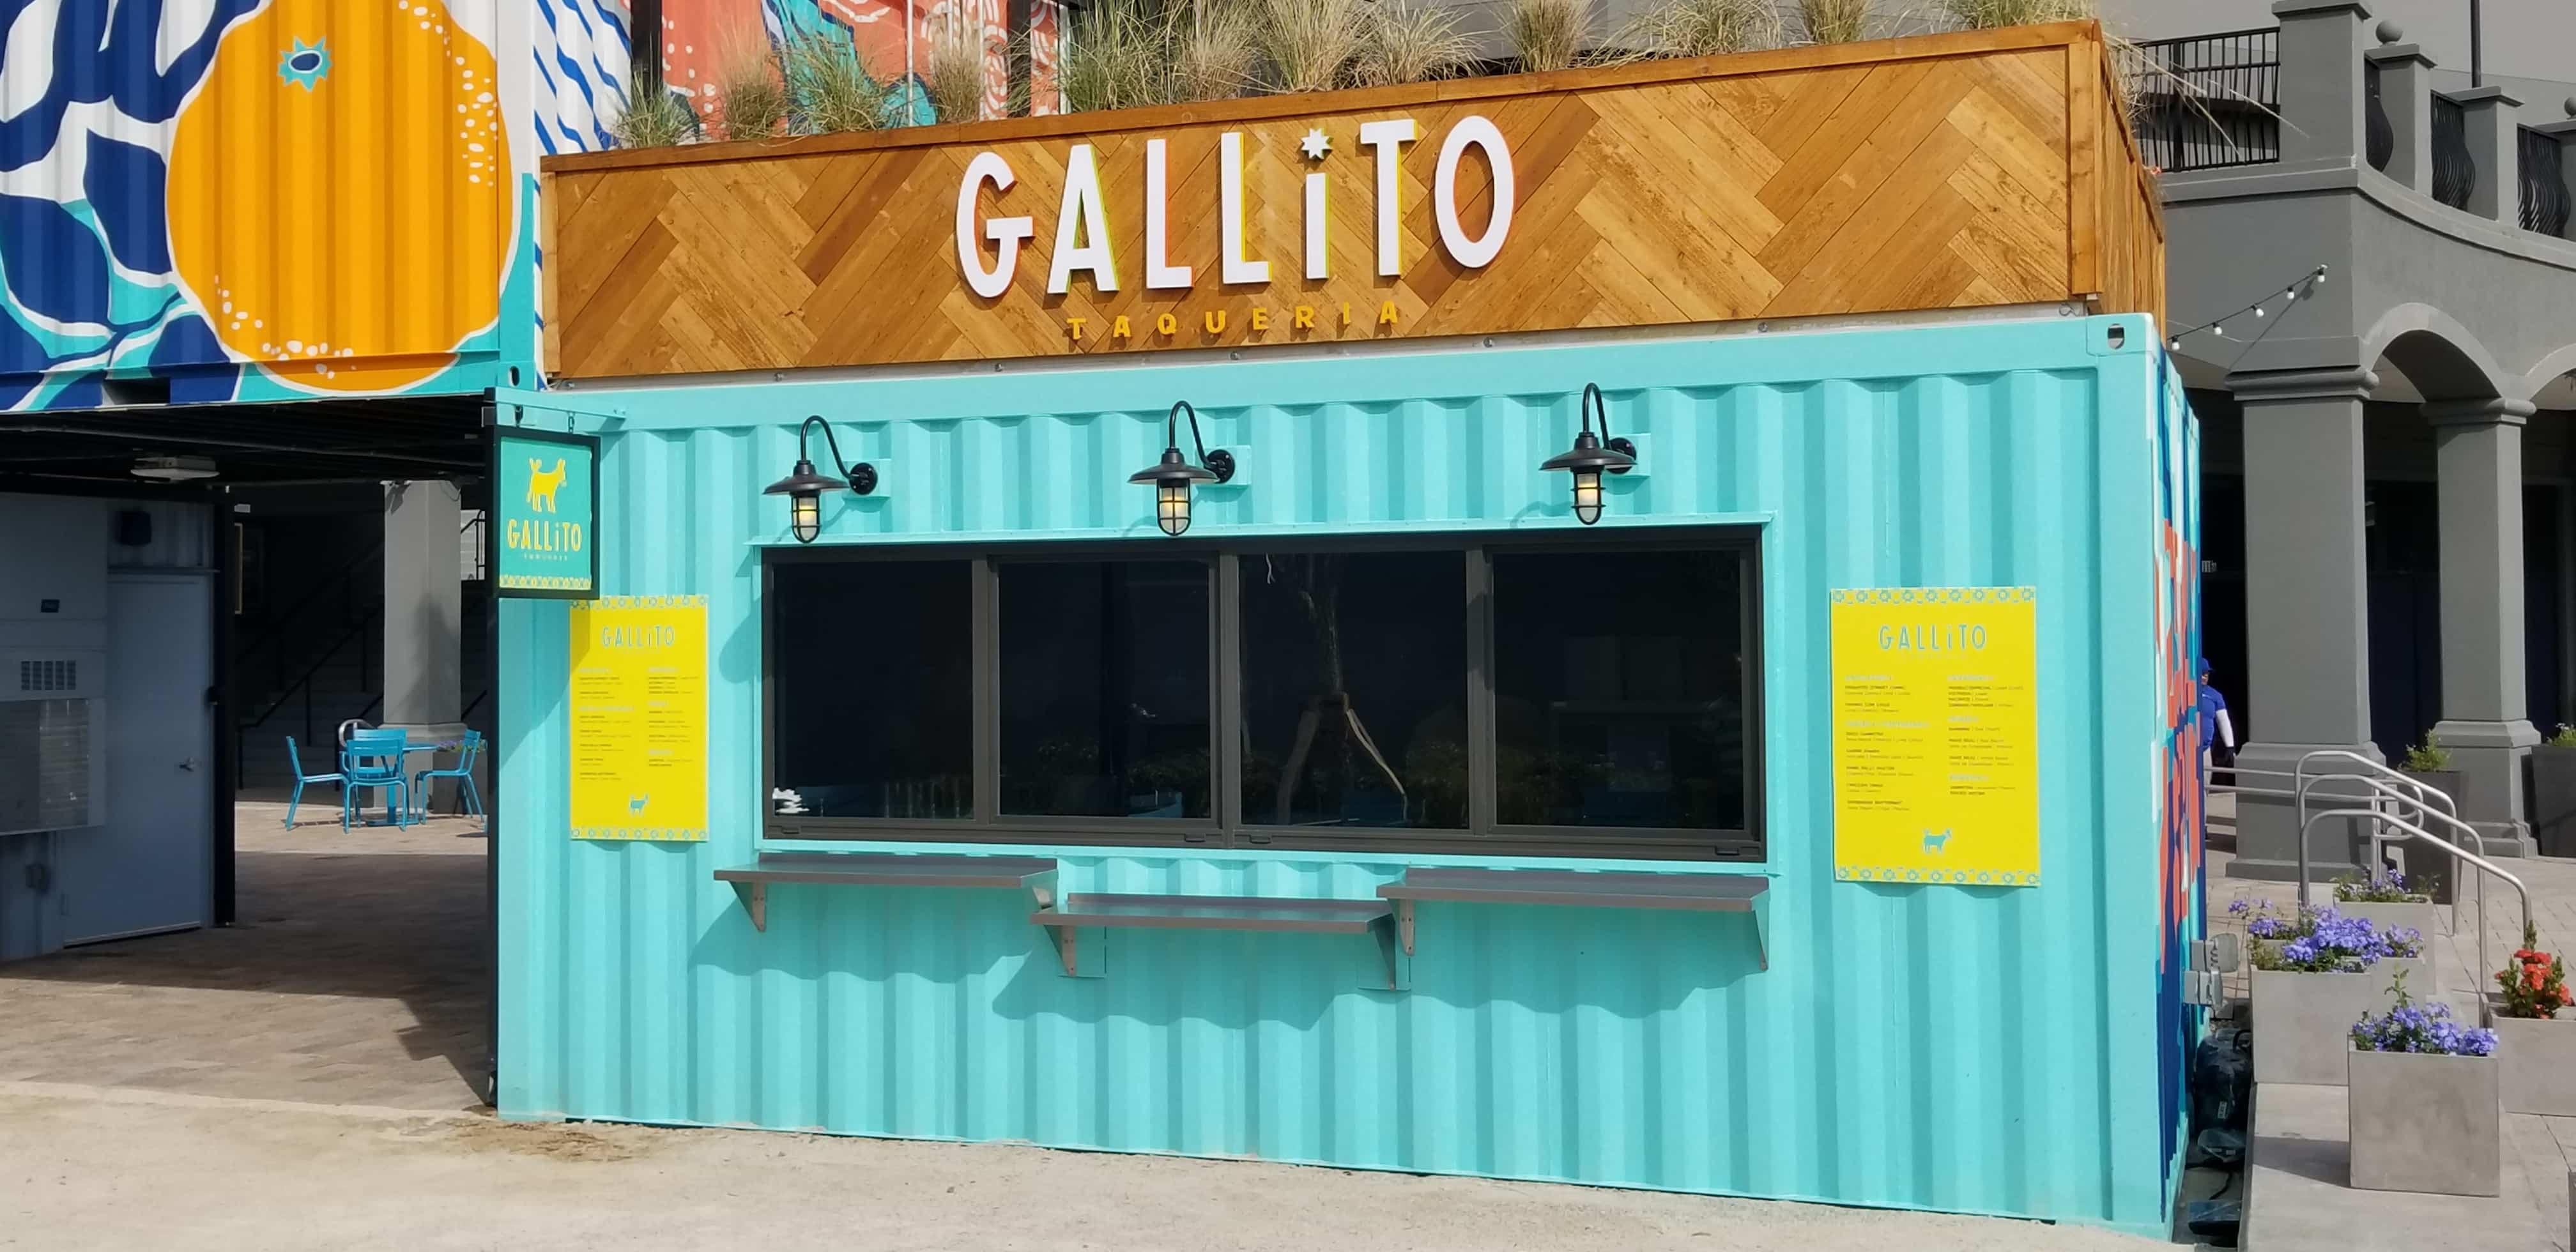 Sparkman Wharf - Gallito Taqueria